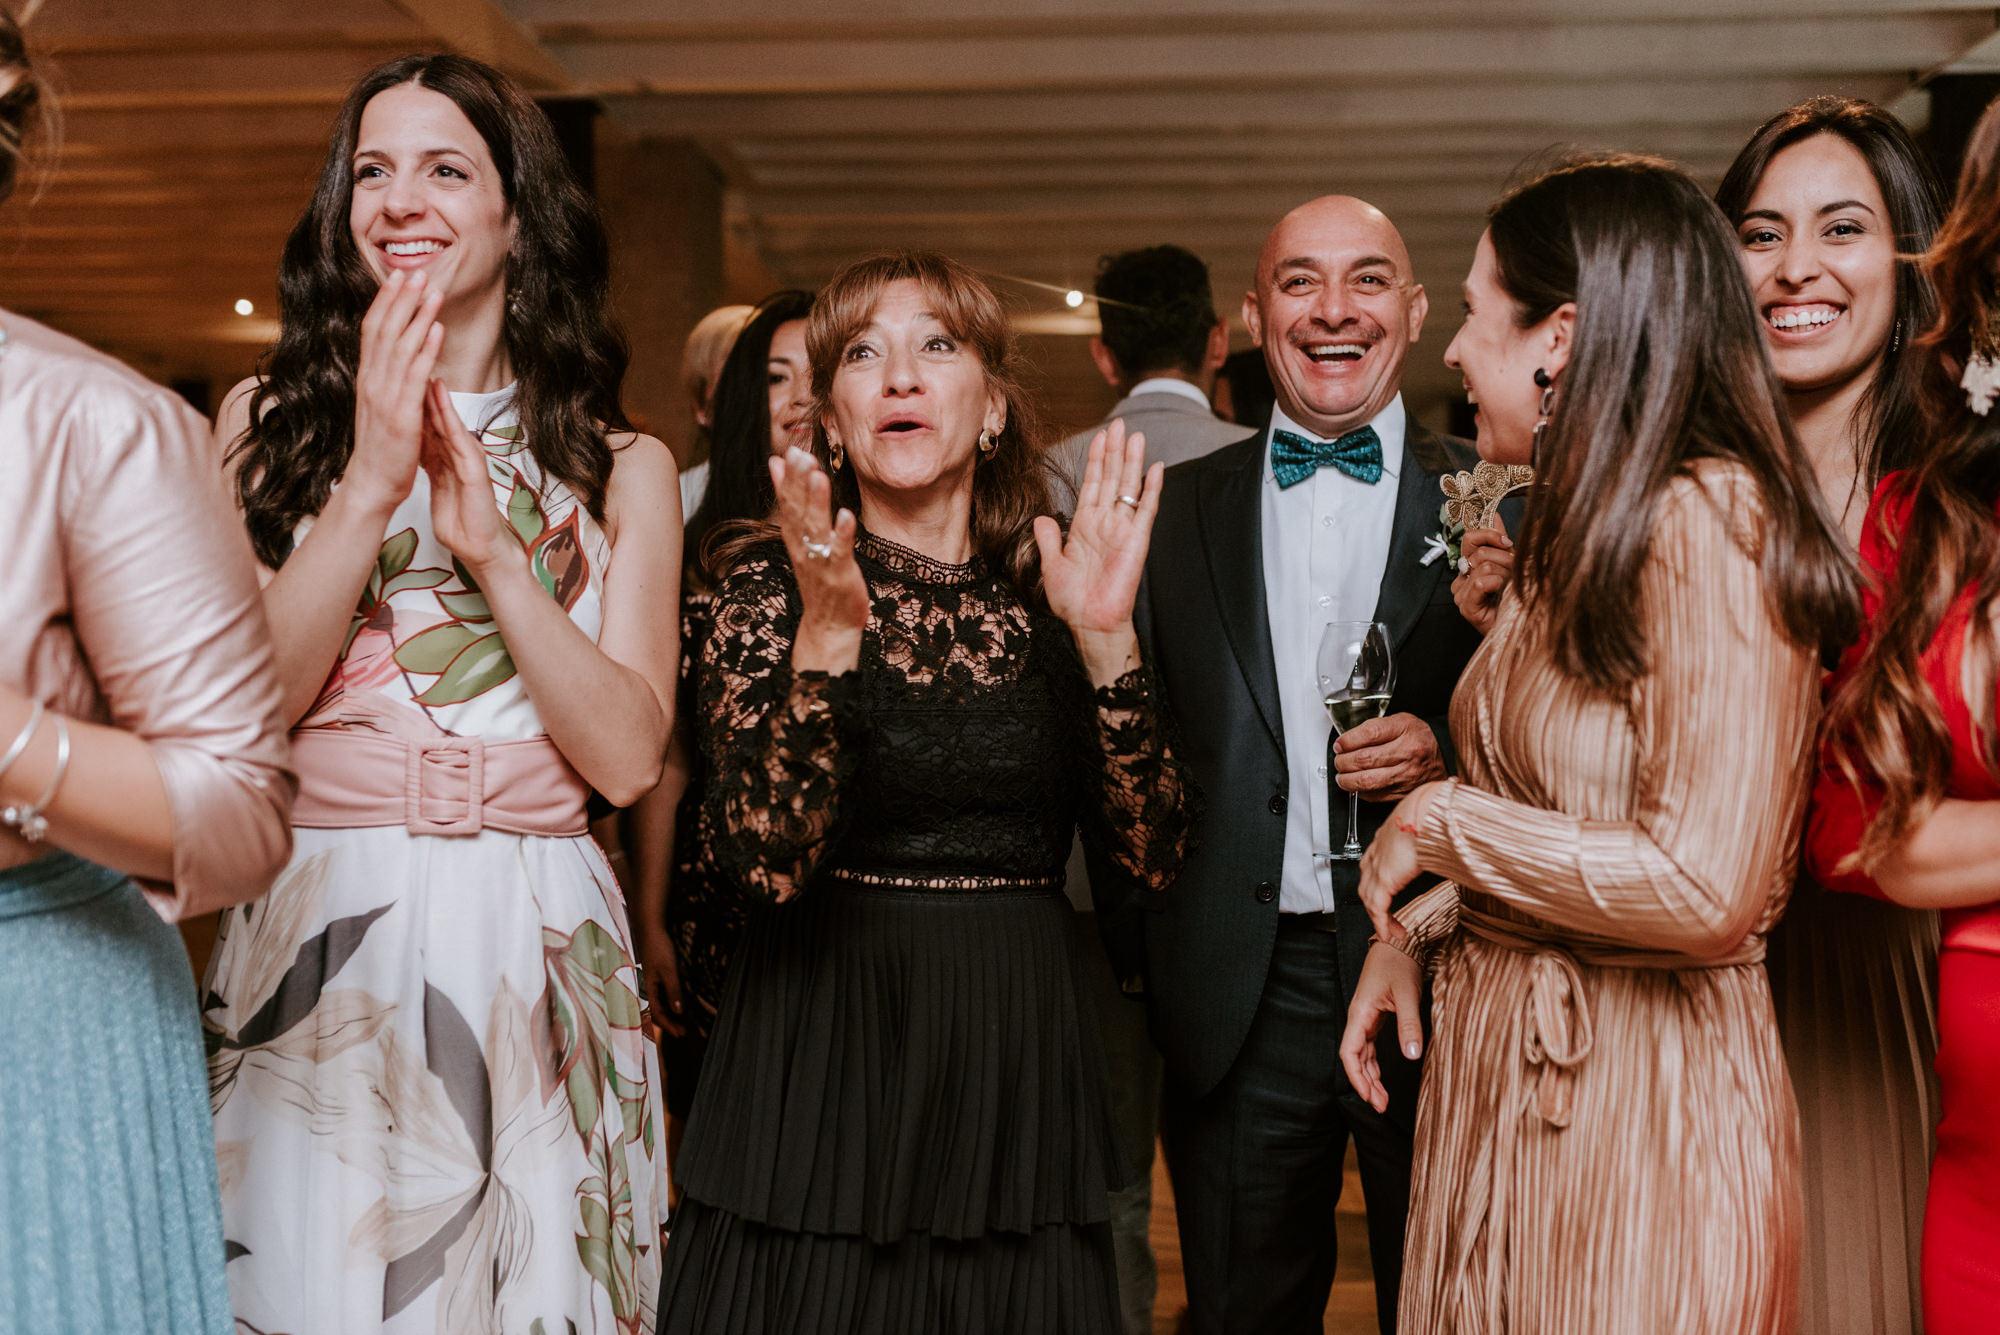 FOTO+PHOTO+BODA+WEDDING+ITALIA+ITALY+MAURICIO+GARAY+MAURICIOGARAY+WEDDINPHOTOGRAPHER+FOTOGRAFODEBODA-1611.jpg